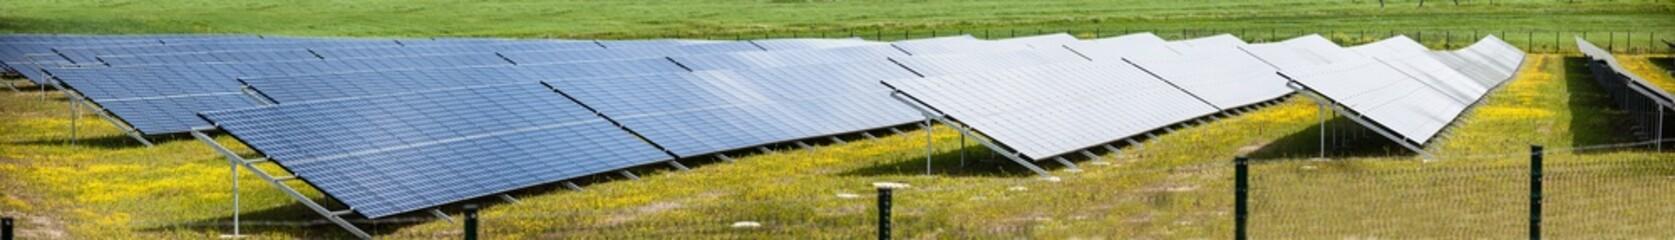 Solar panels panorama